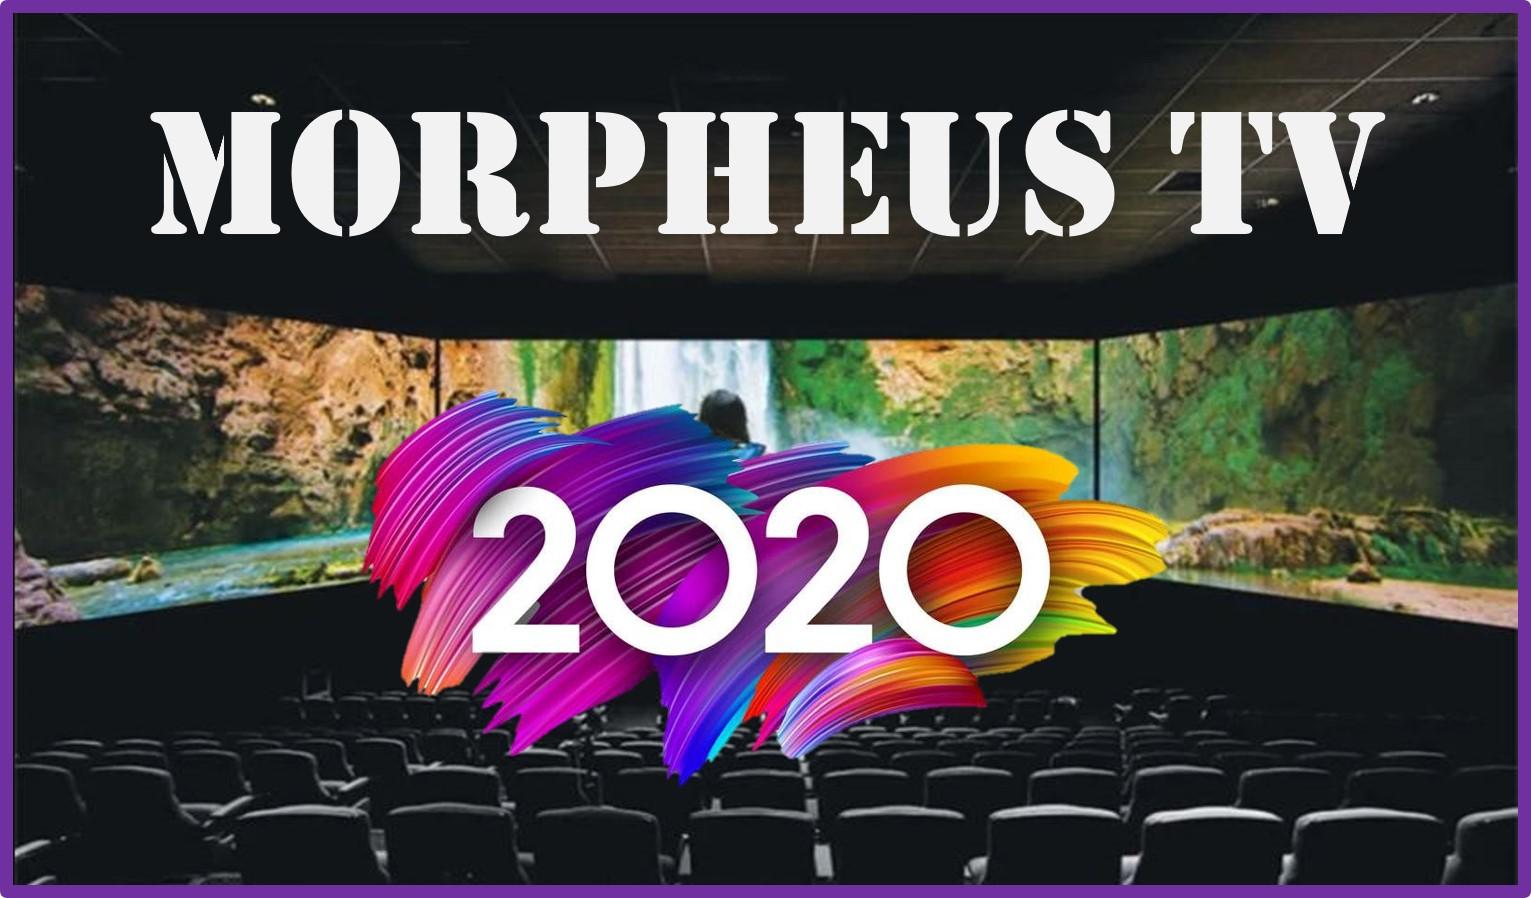 morpheus tv 2020